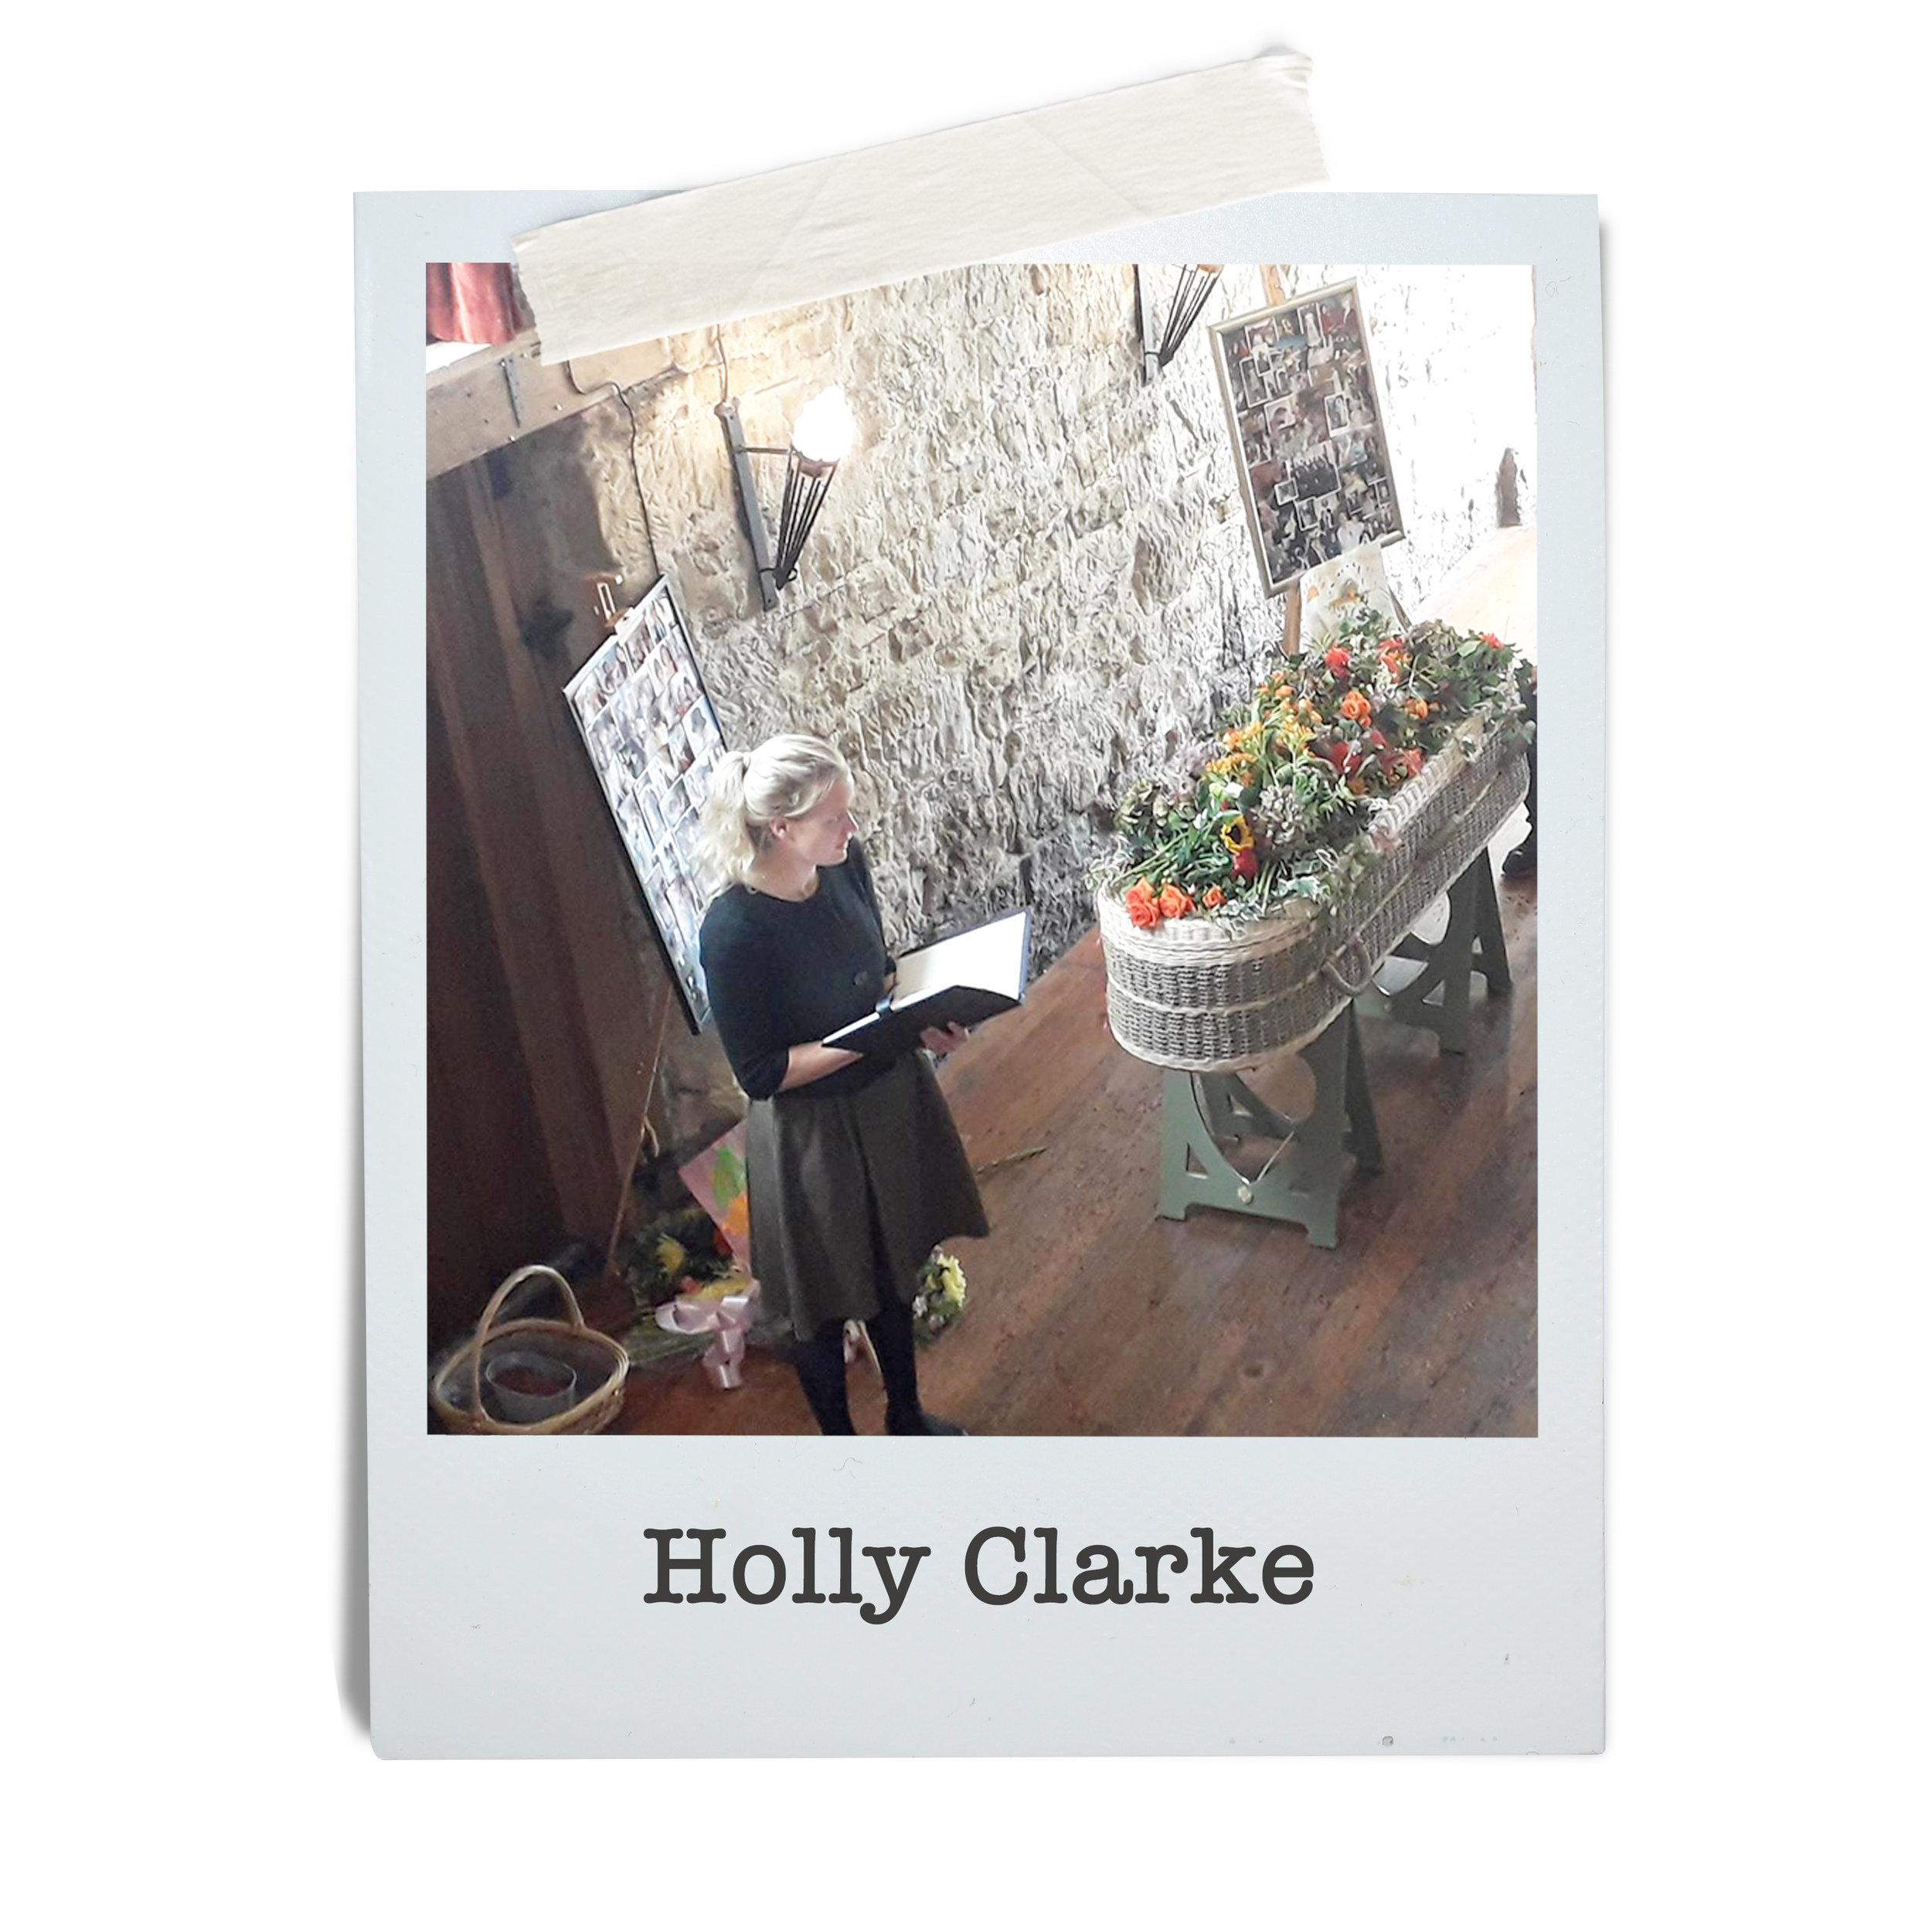 Holly Clarke